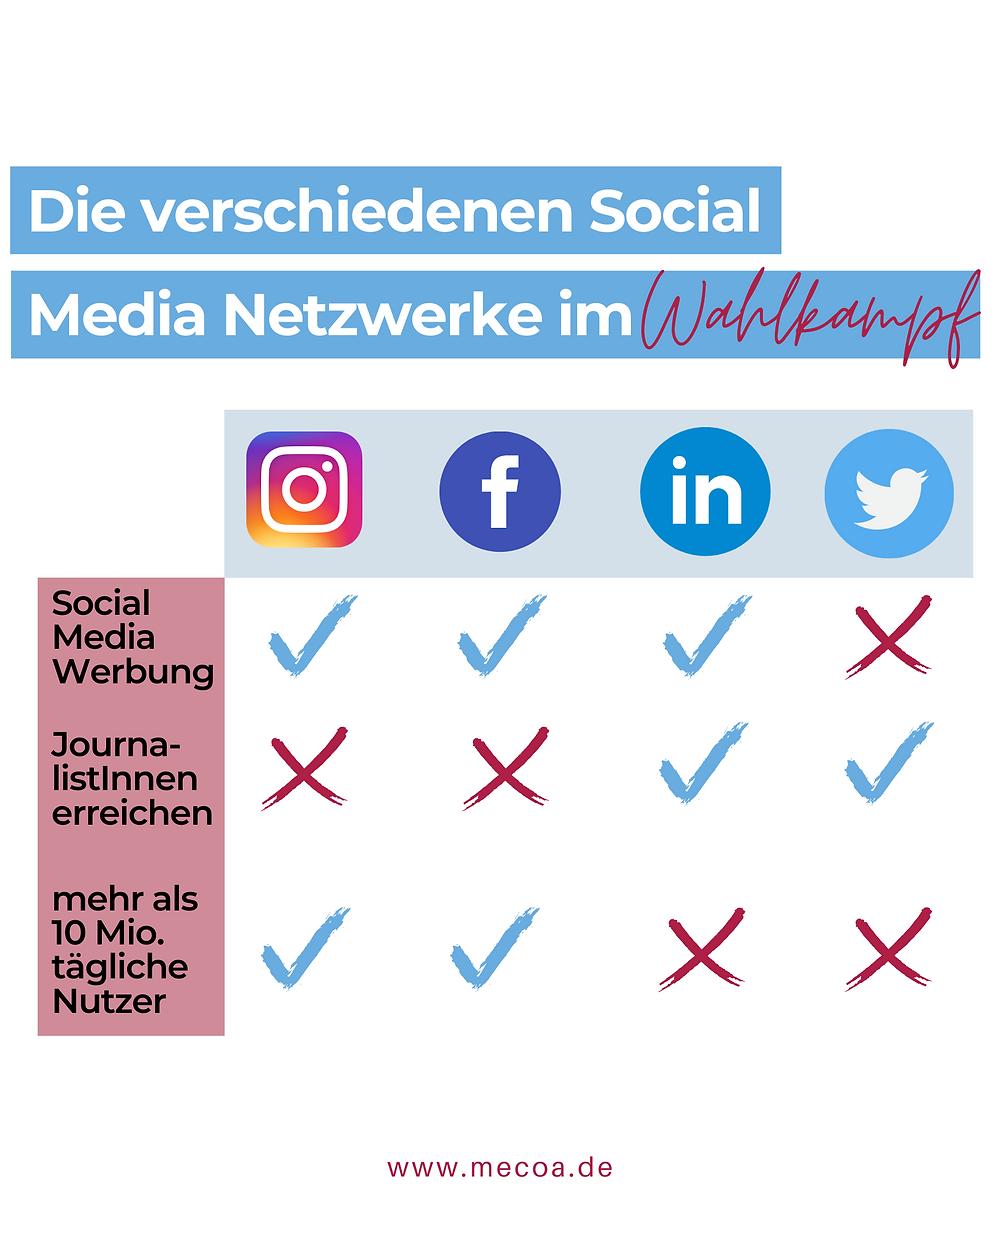 Soziale Medien im Wahlkampf